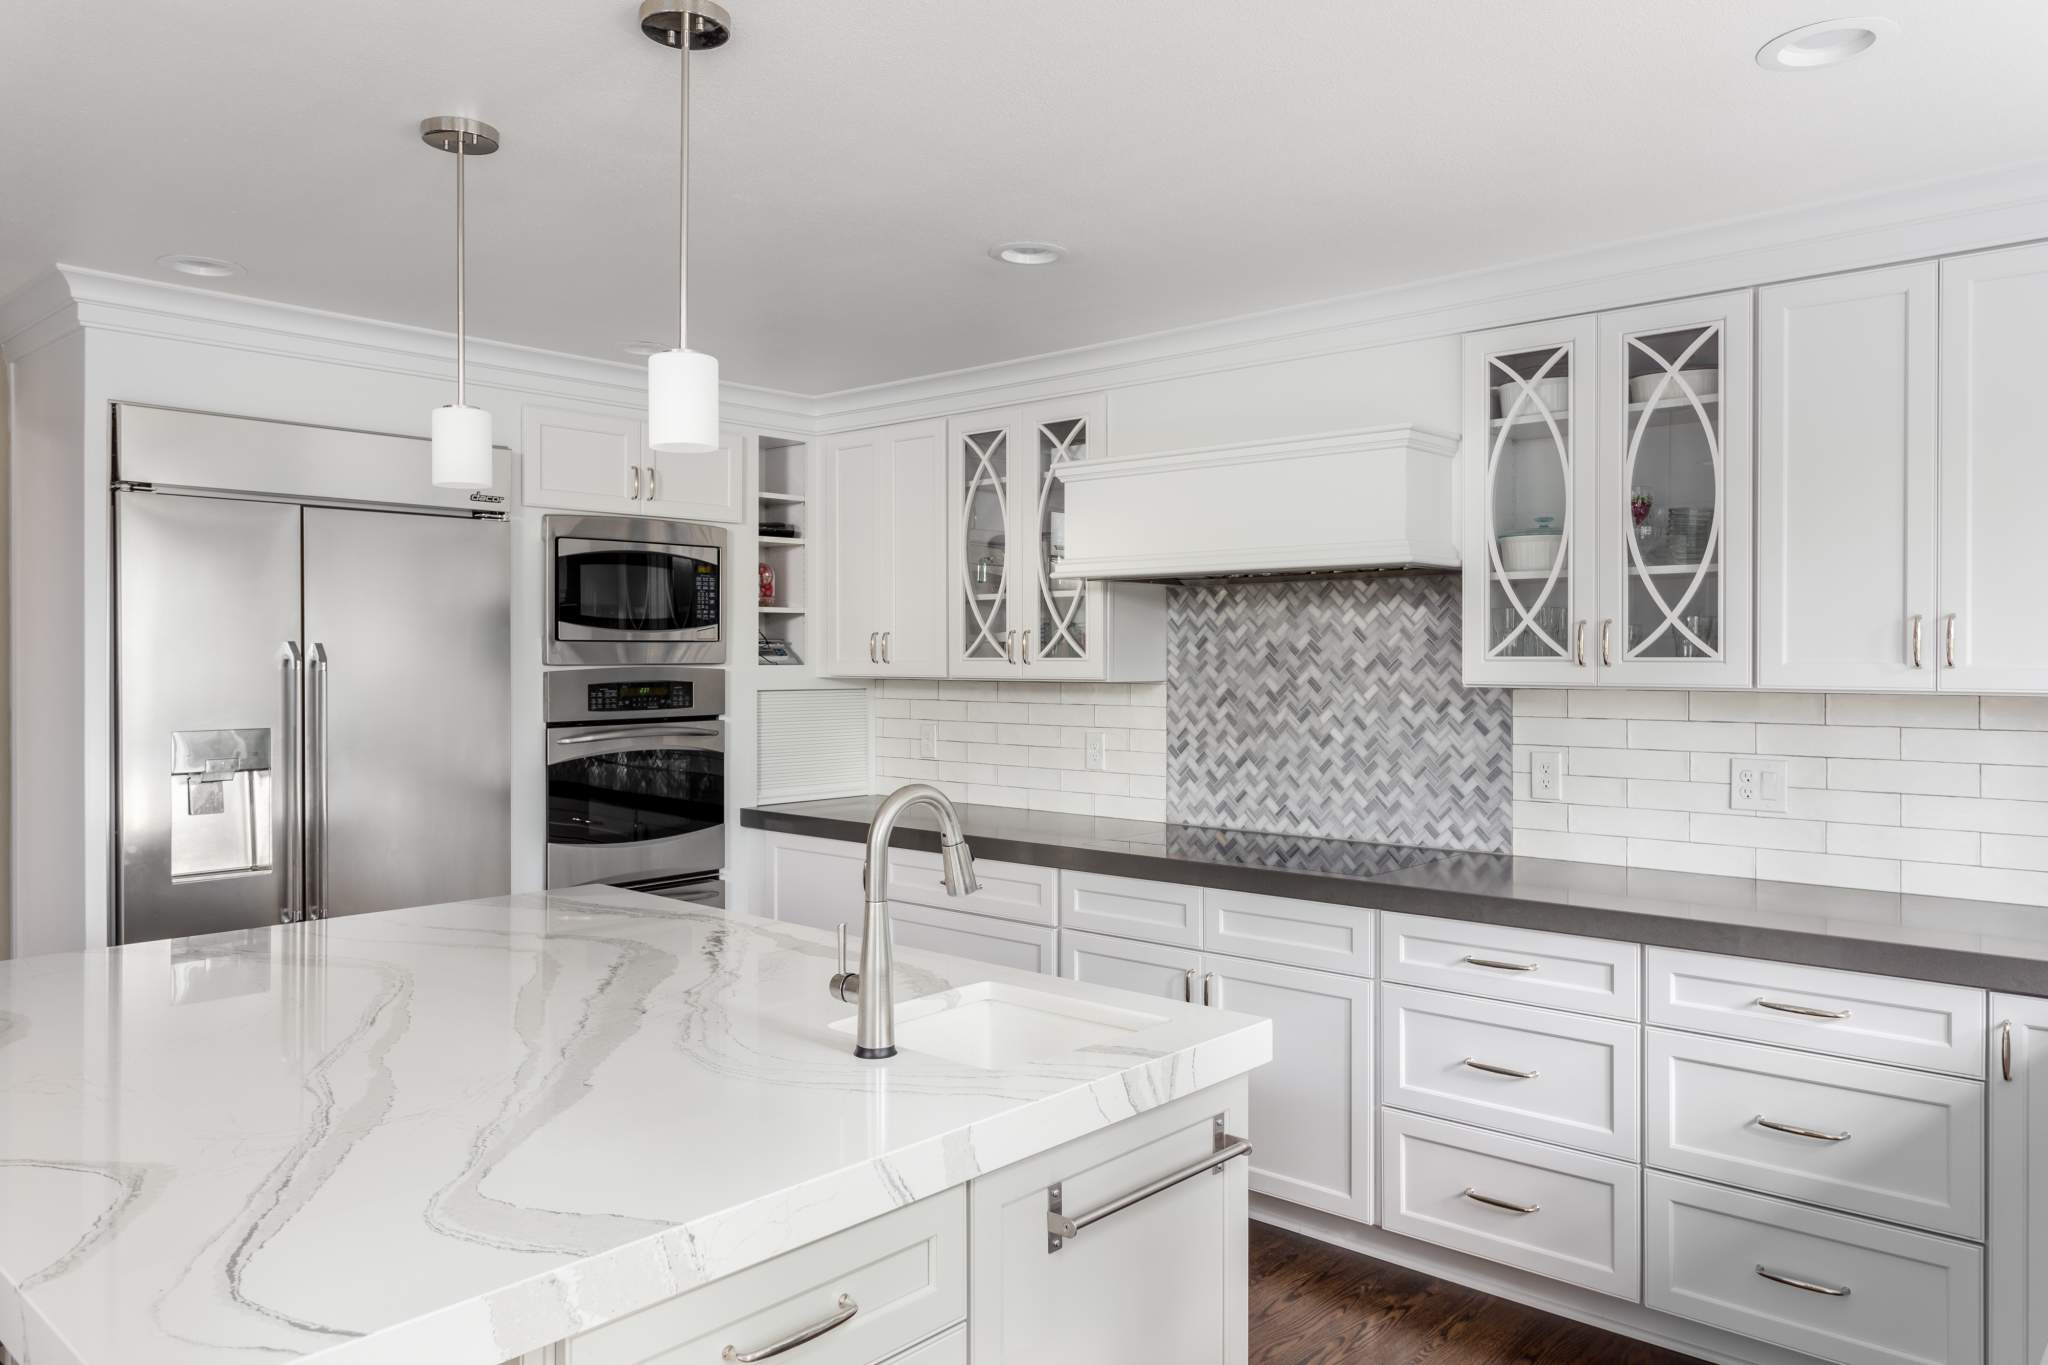 sustainable kitchen quartz countertops